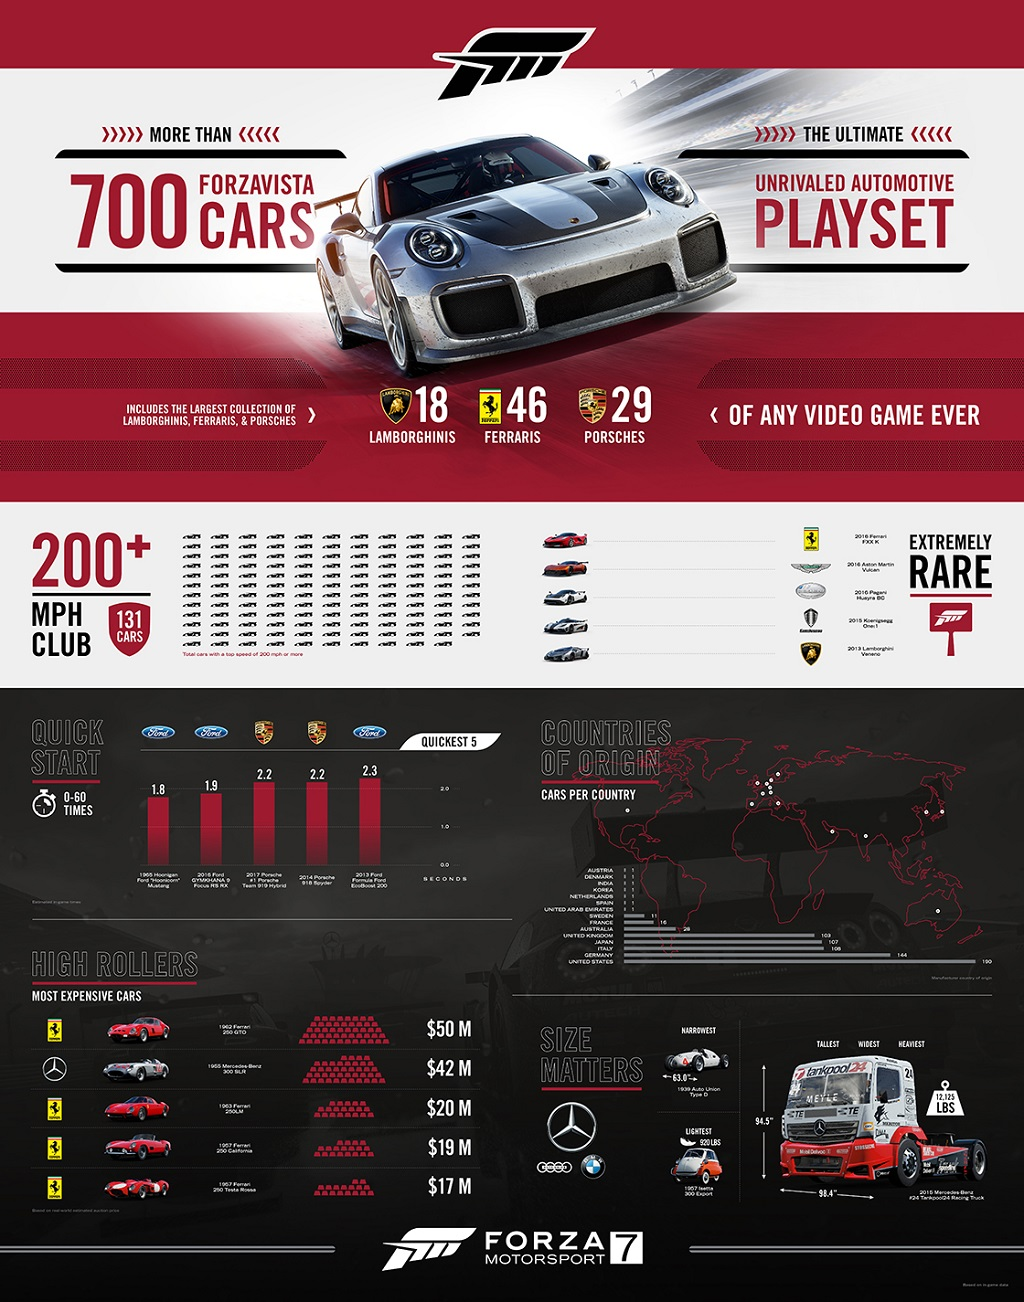 Forza Garage - Racing Cars - Forza Motorsport 7 1.jpg